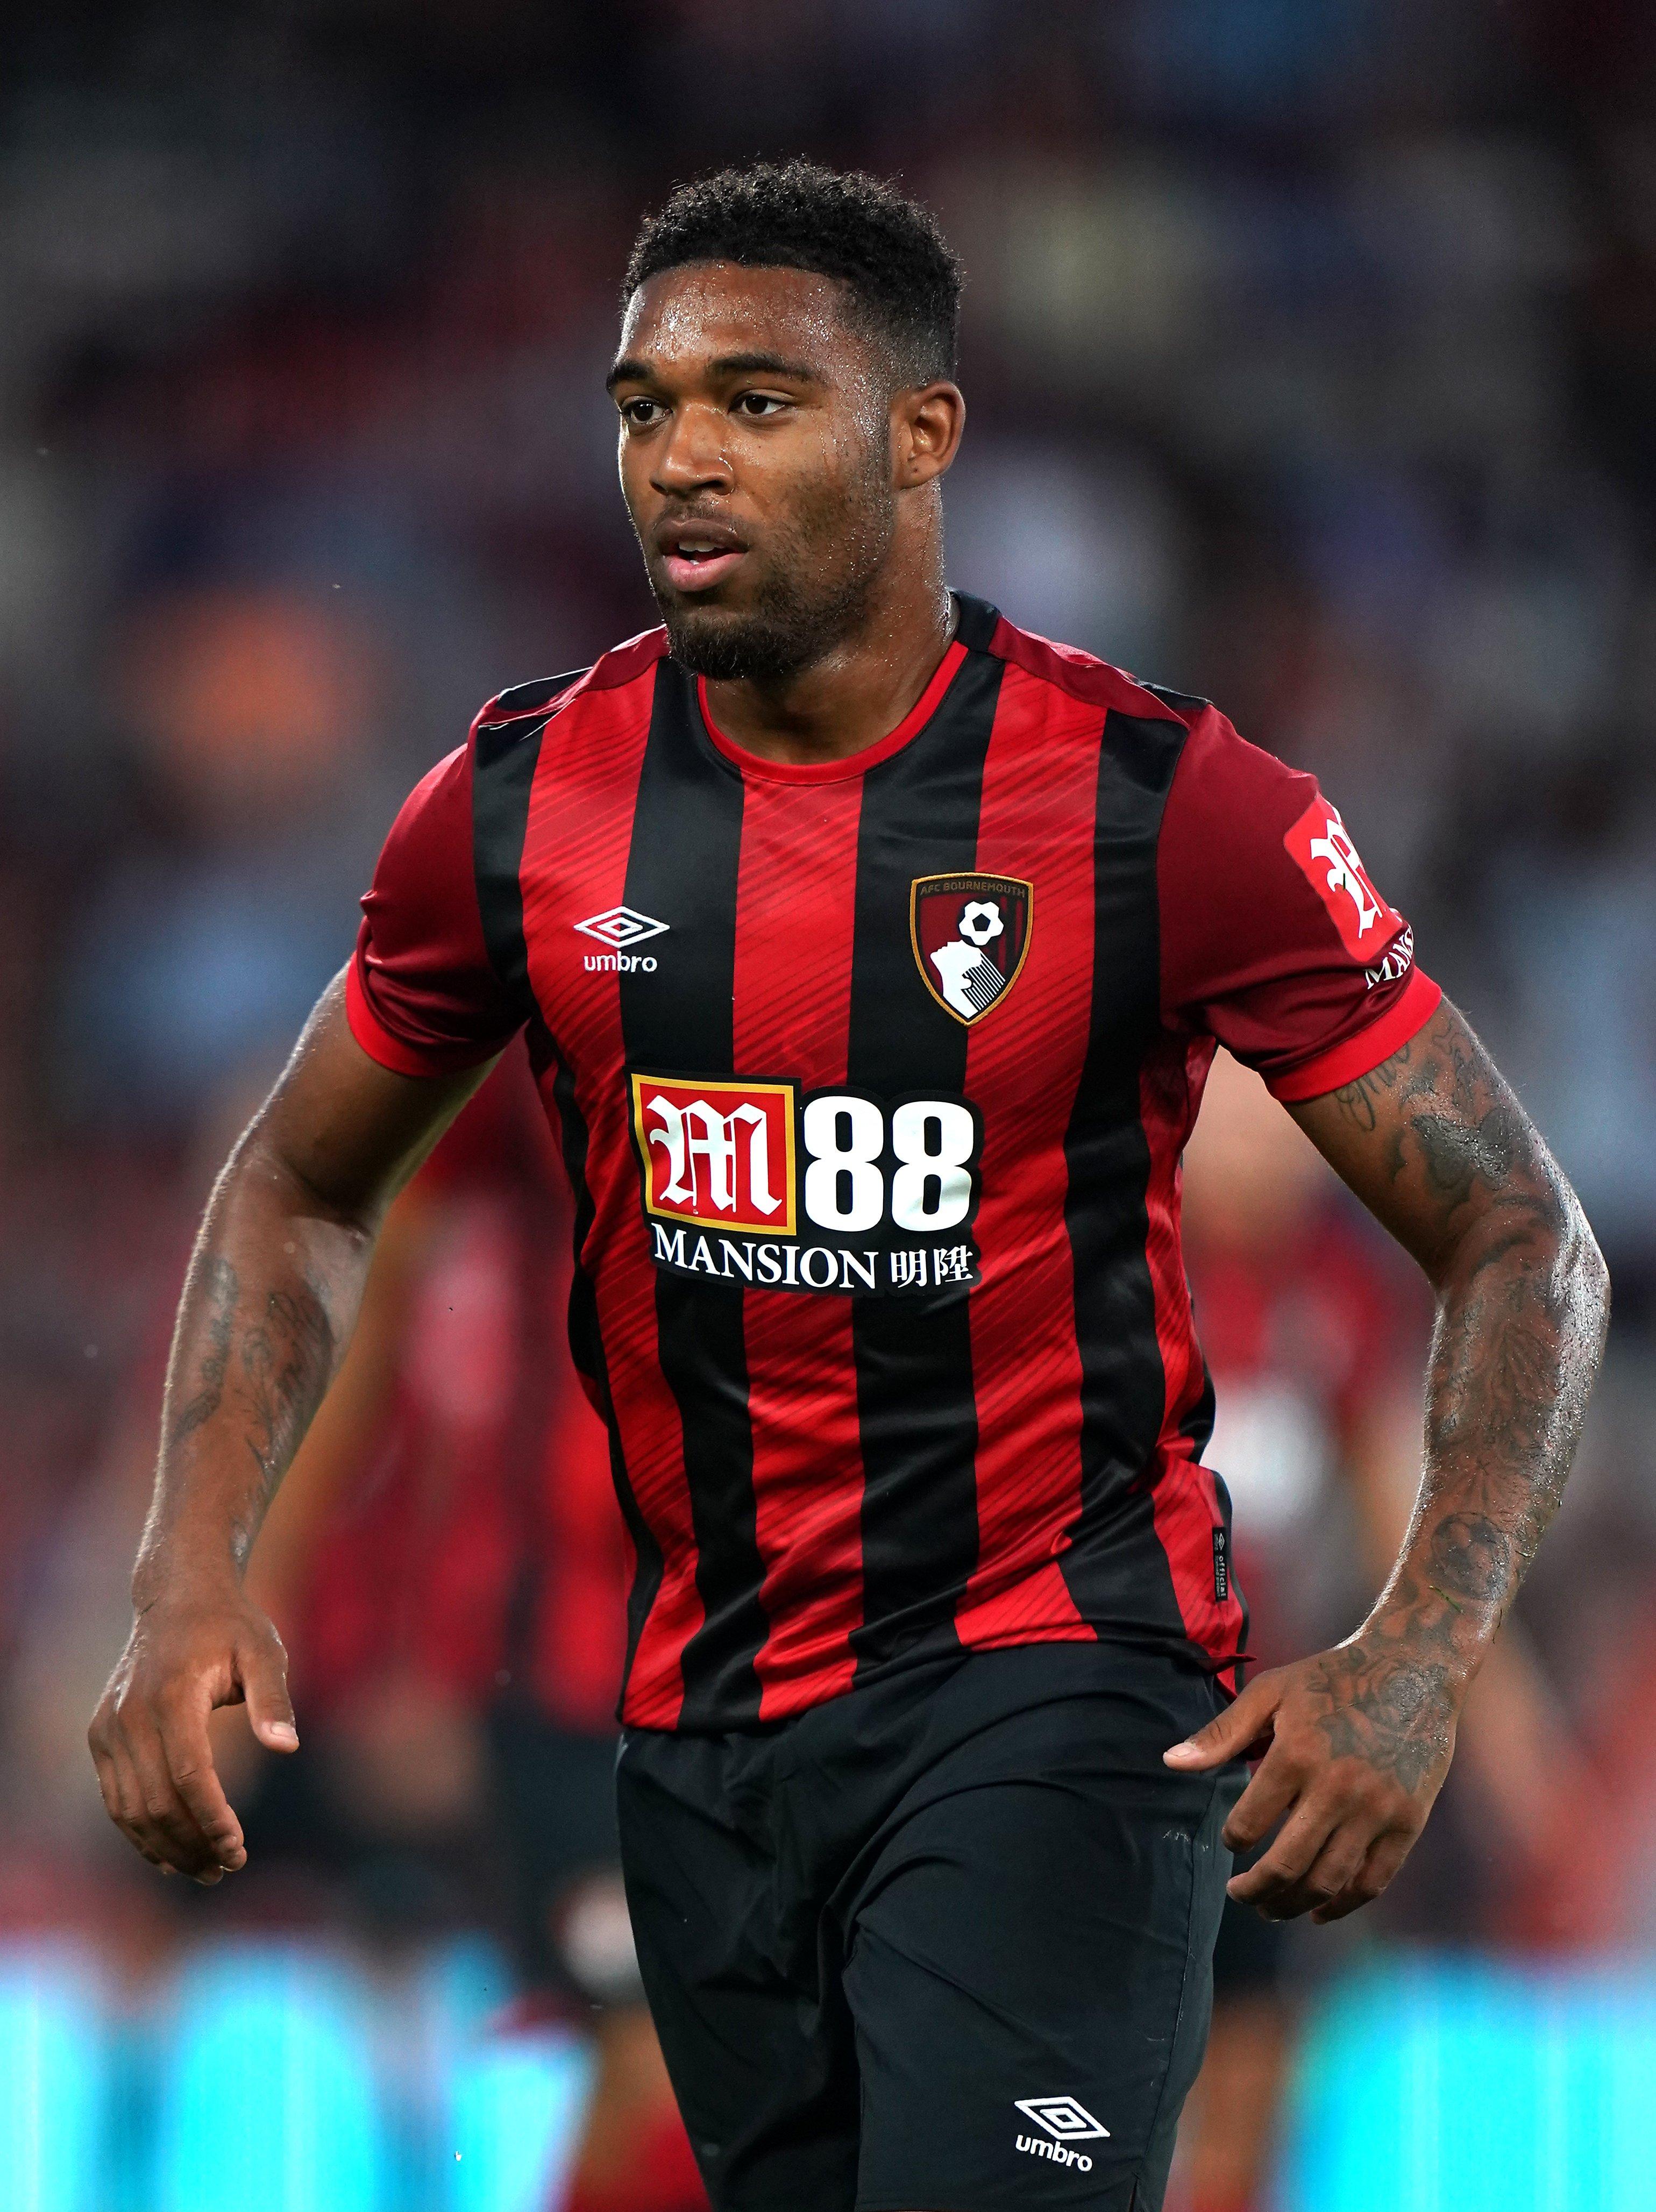 Bournemouth release £15million signing Jordon Ibe